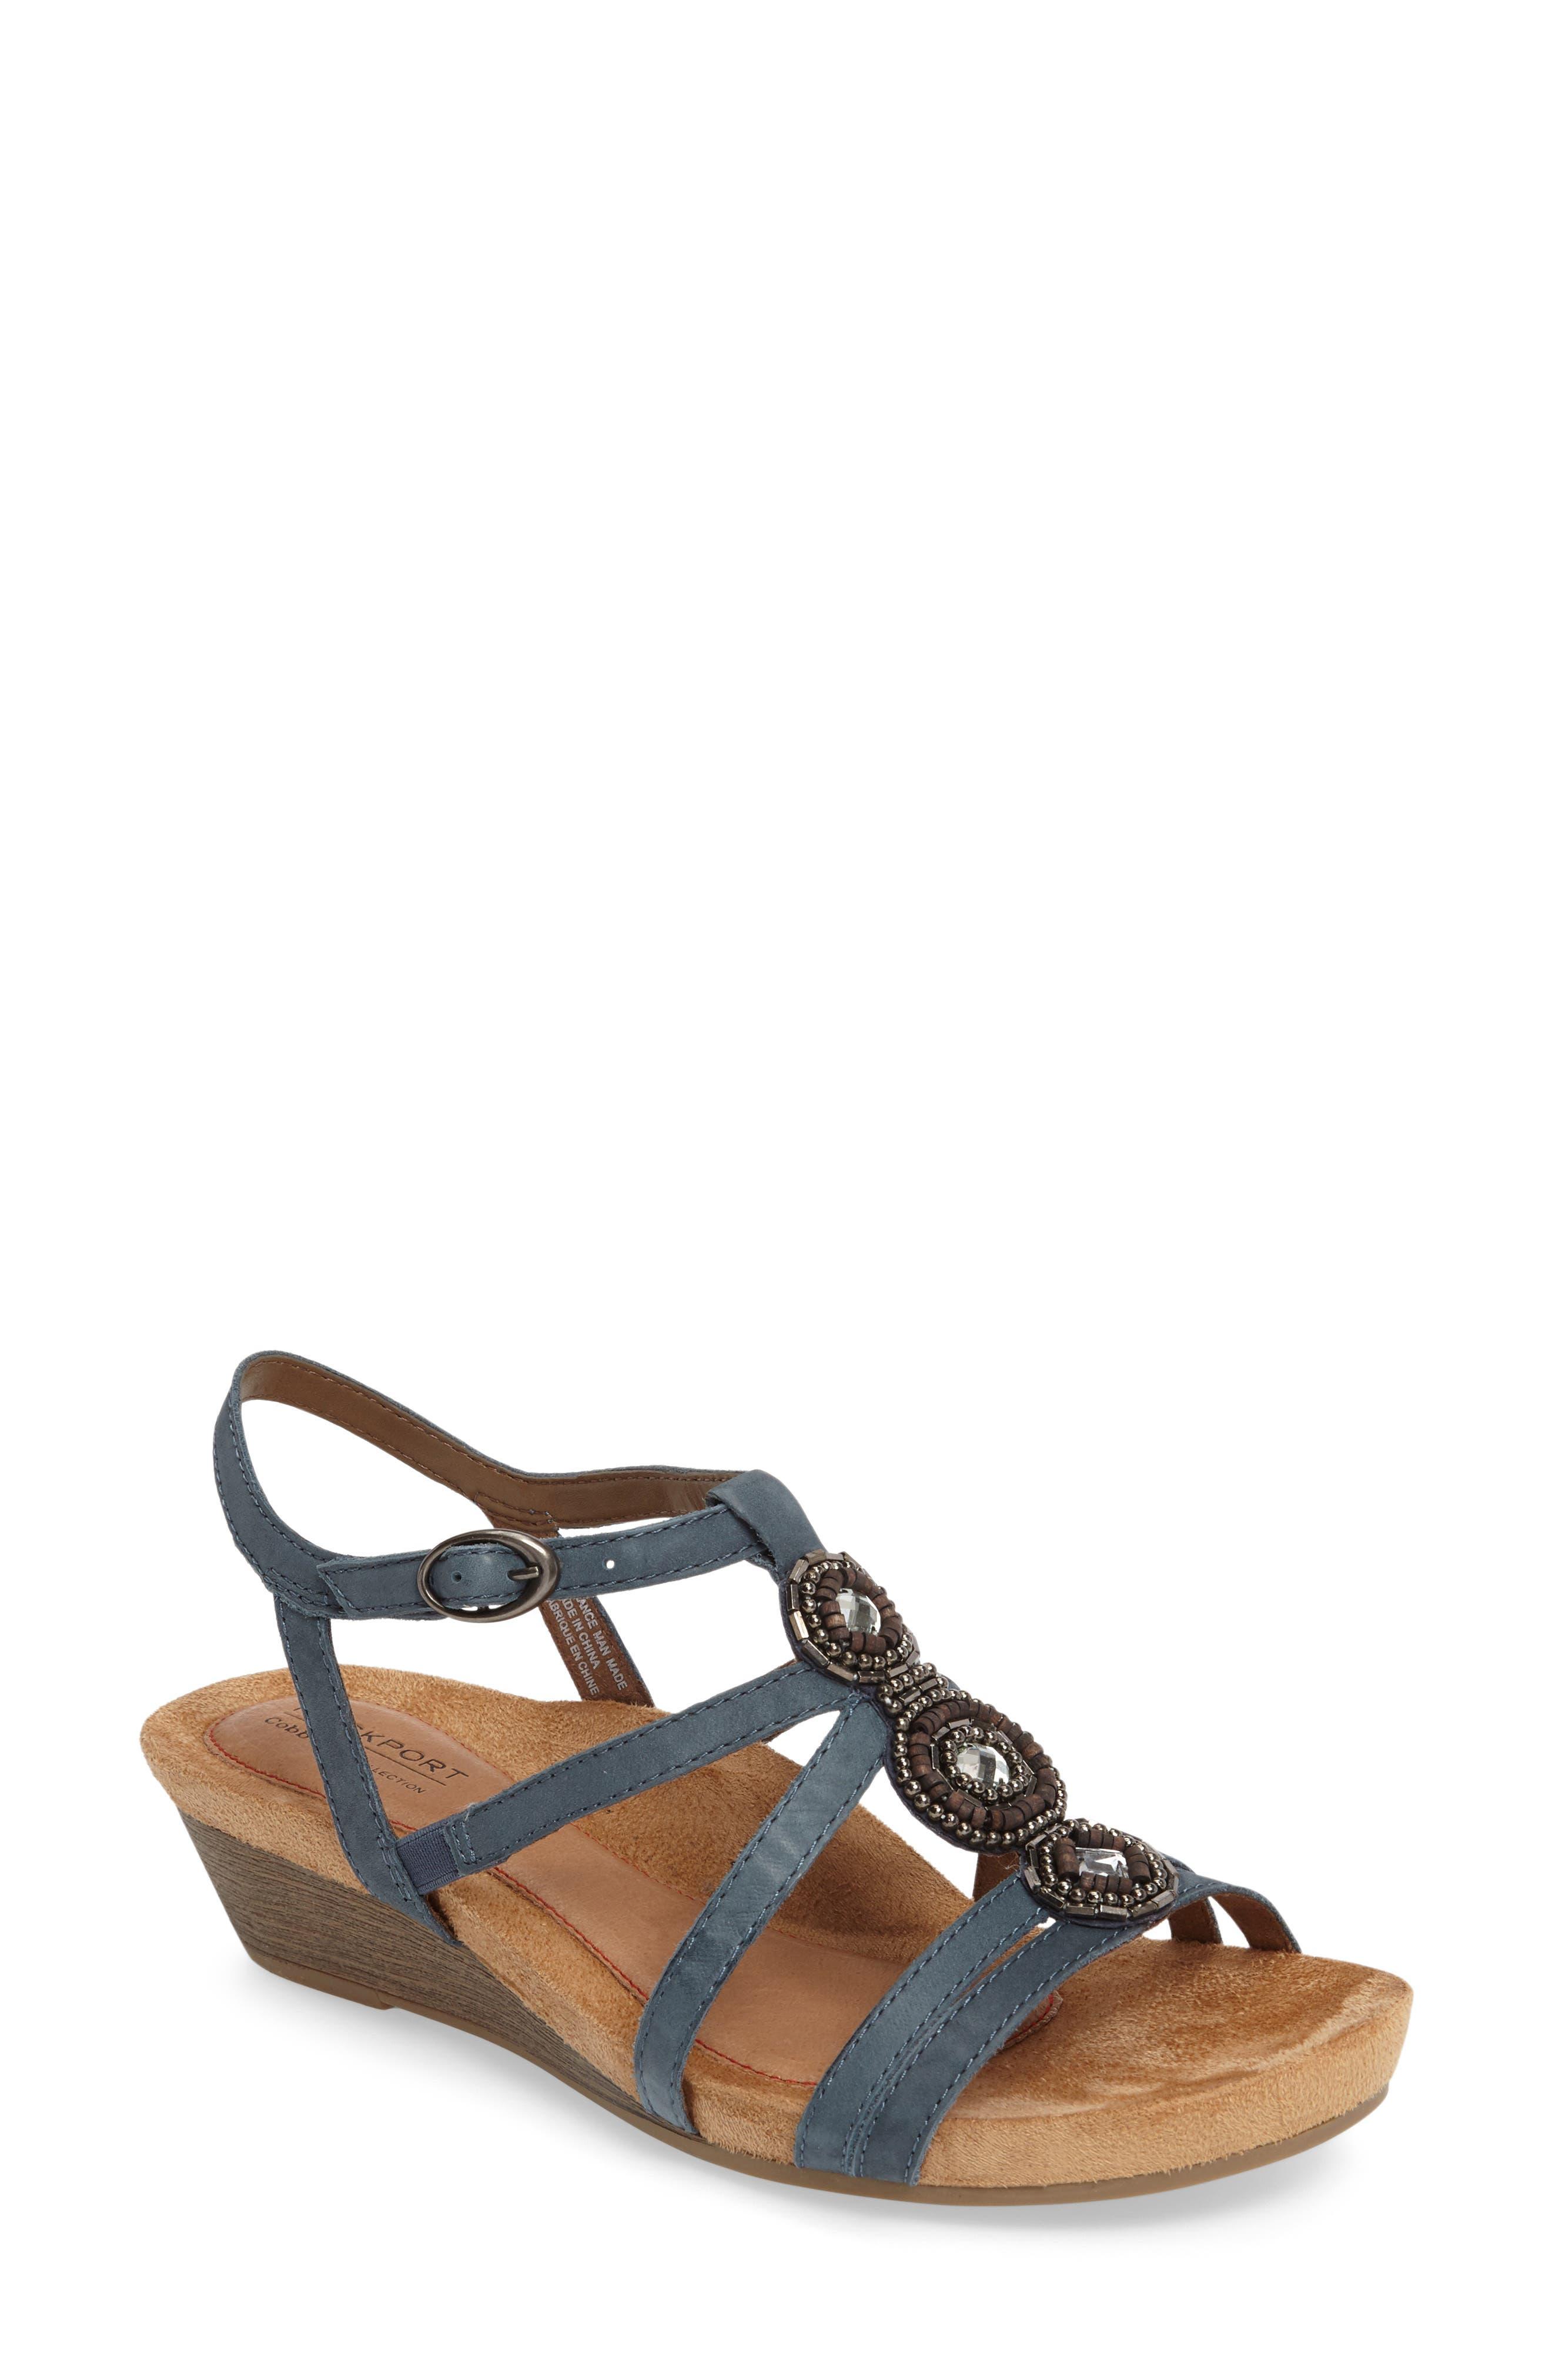 'Hannah' Leather Sandal,                             Main thumbnail 1, color,                             BLUE NUBUCK